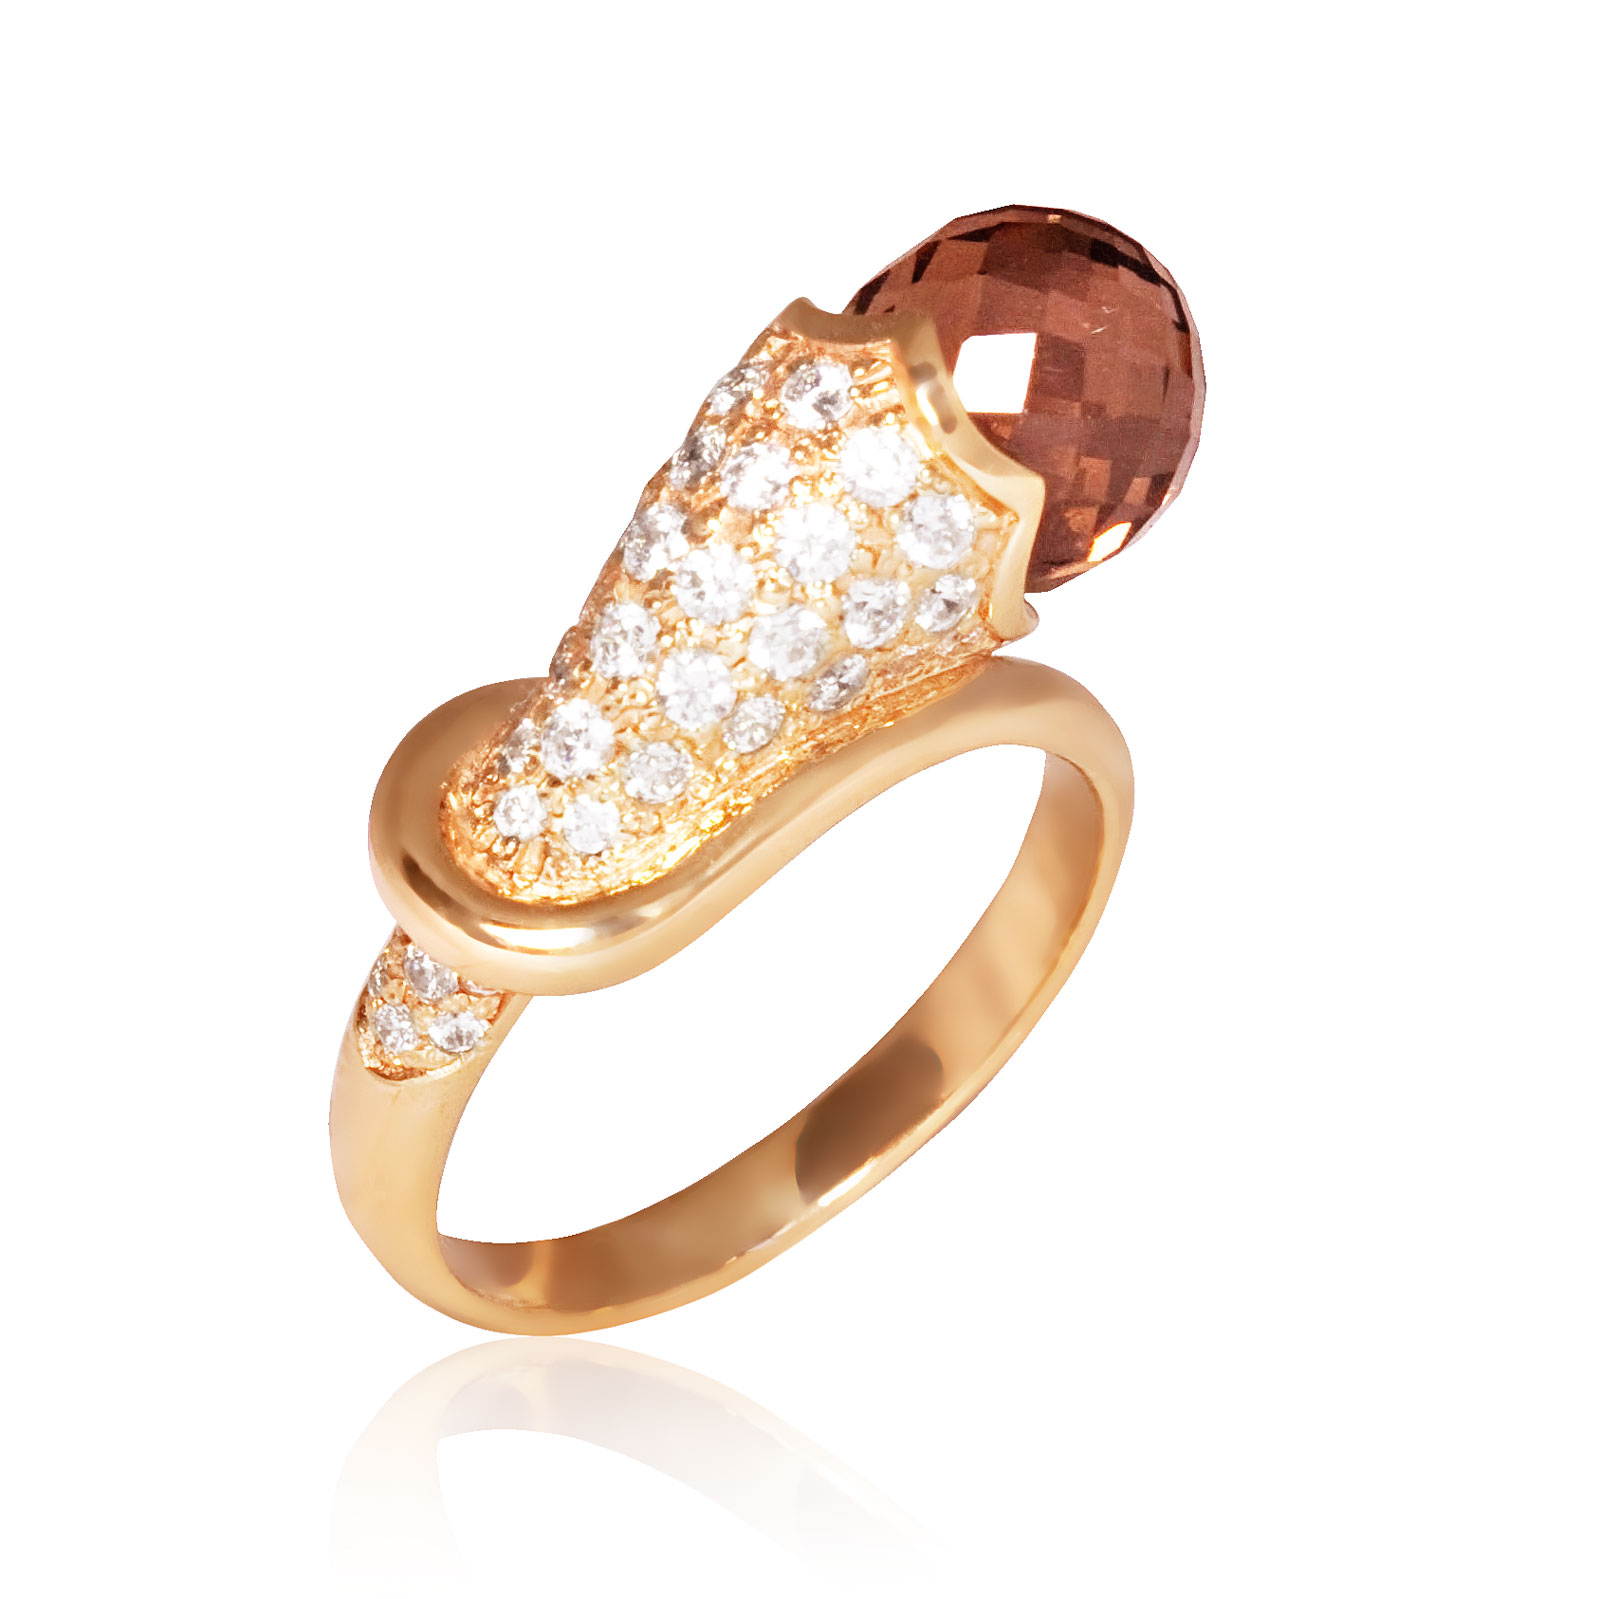 Золоте кільце з раухтопазом «Christiana»